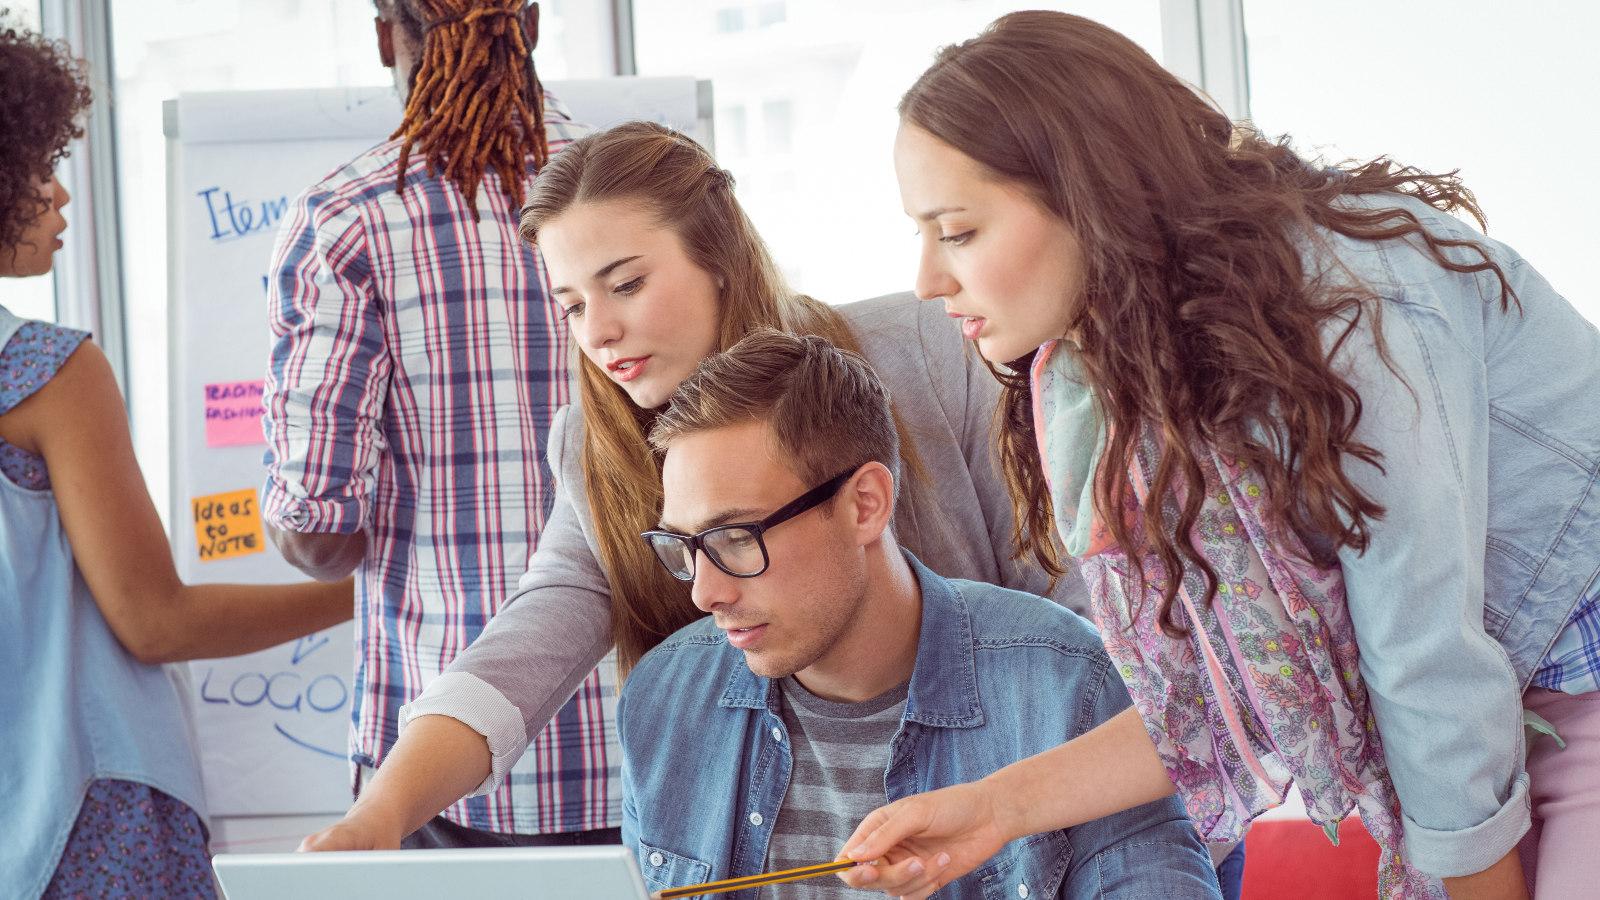 free-universities-for-international-students-homelingua-university-preparation-course